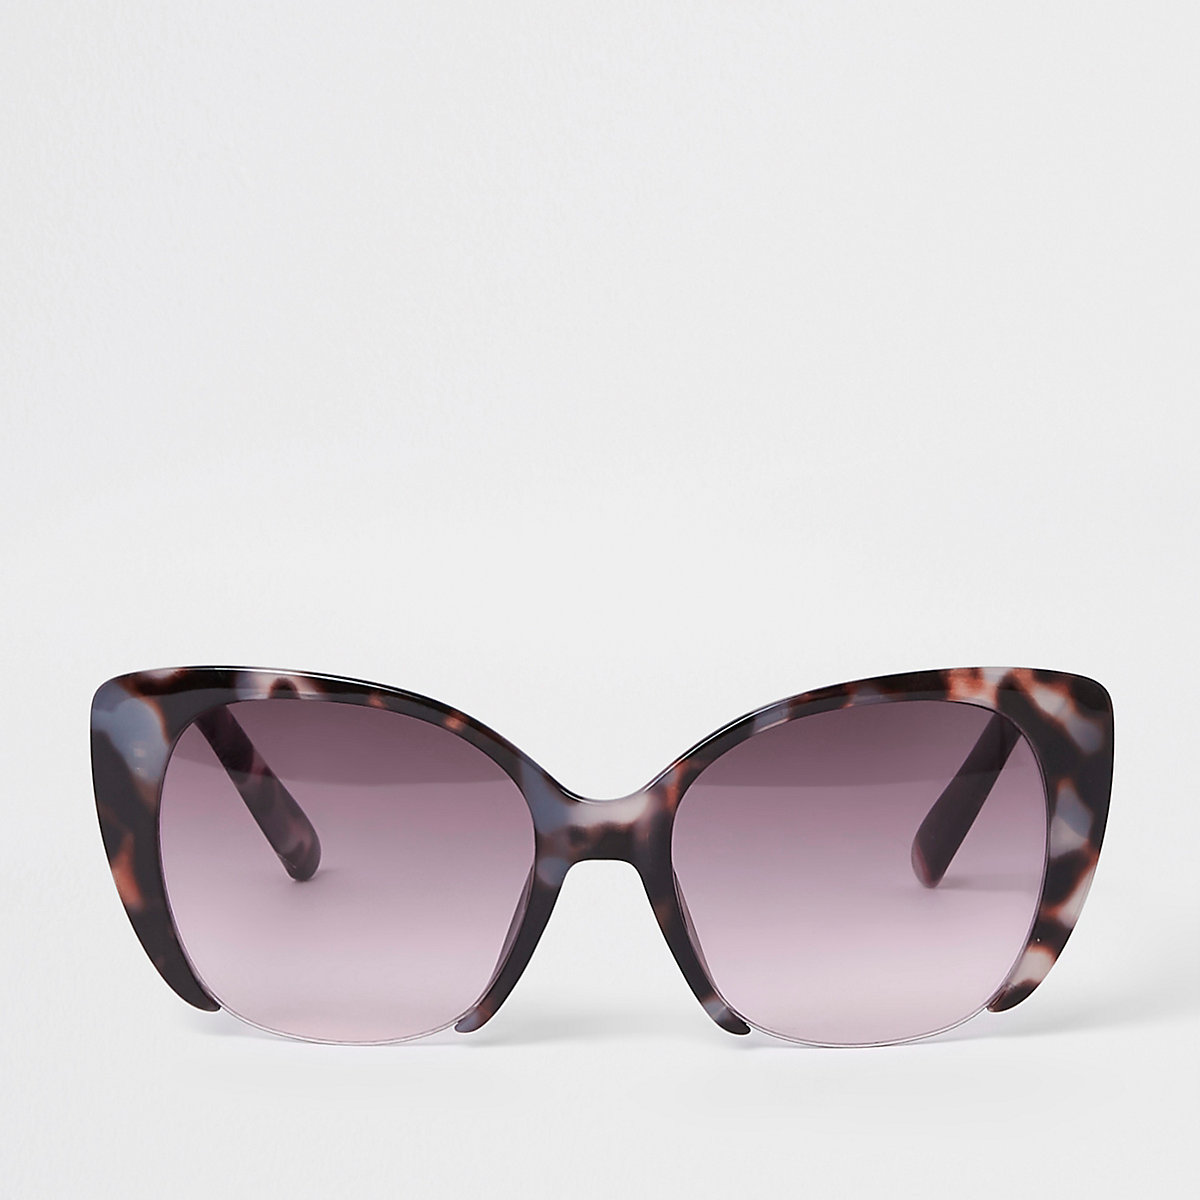 Brown tortoise shell pink lens sunglasses